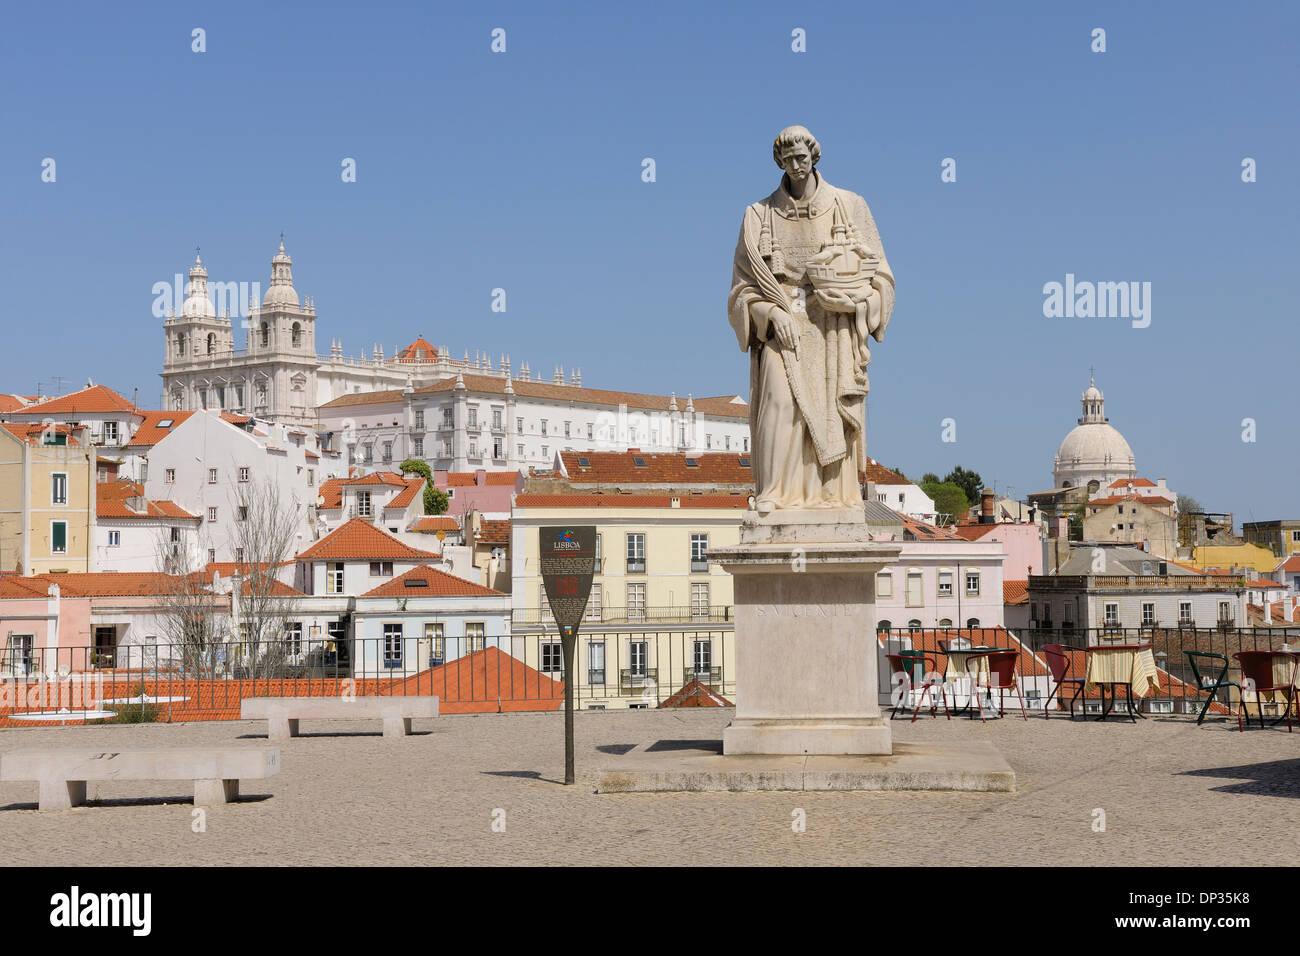 Miradouro das Portas do Sol, Statue de Sao Vicente, Monastère de São Vicente de Fora en arrière-plan, l'Alfama, Lisbonne, Portugal Banque D'Images